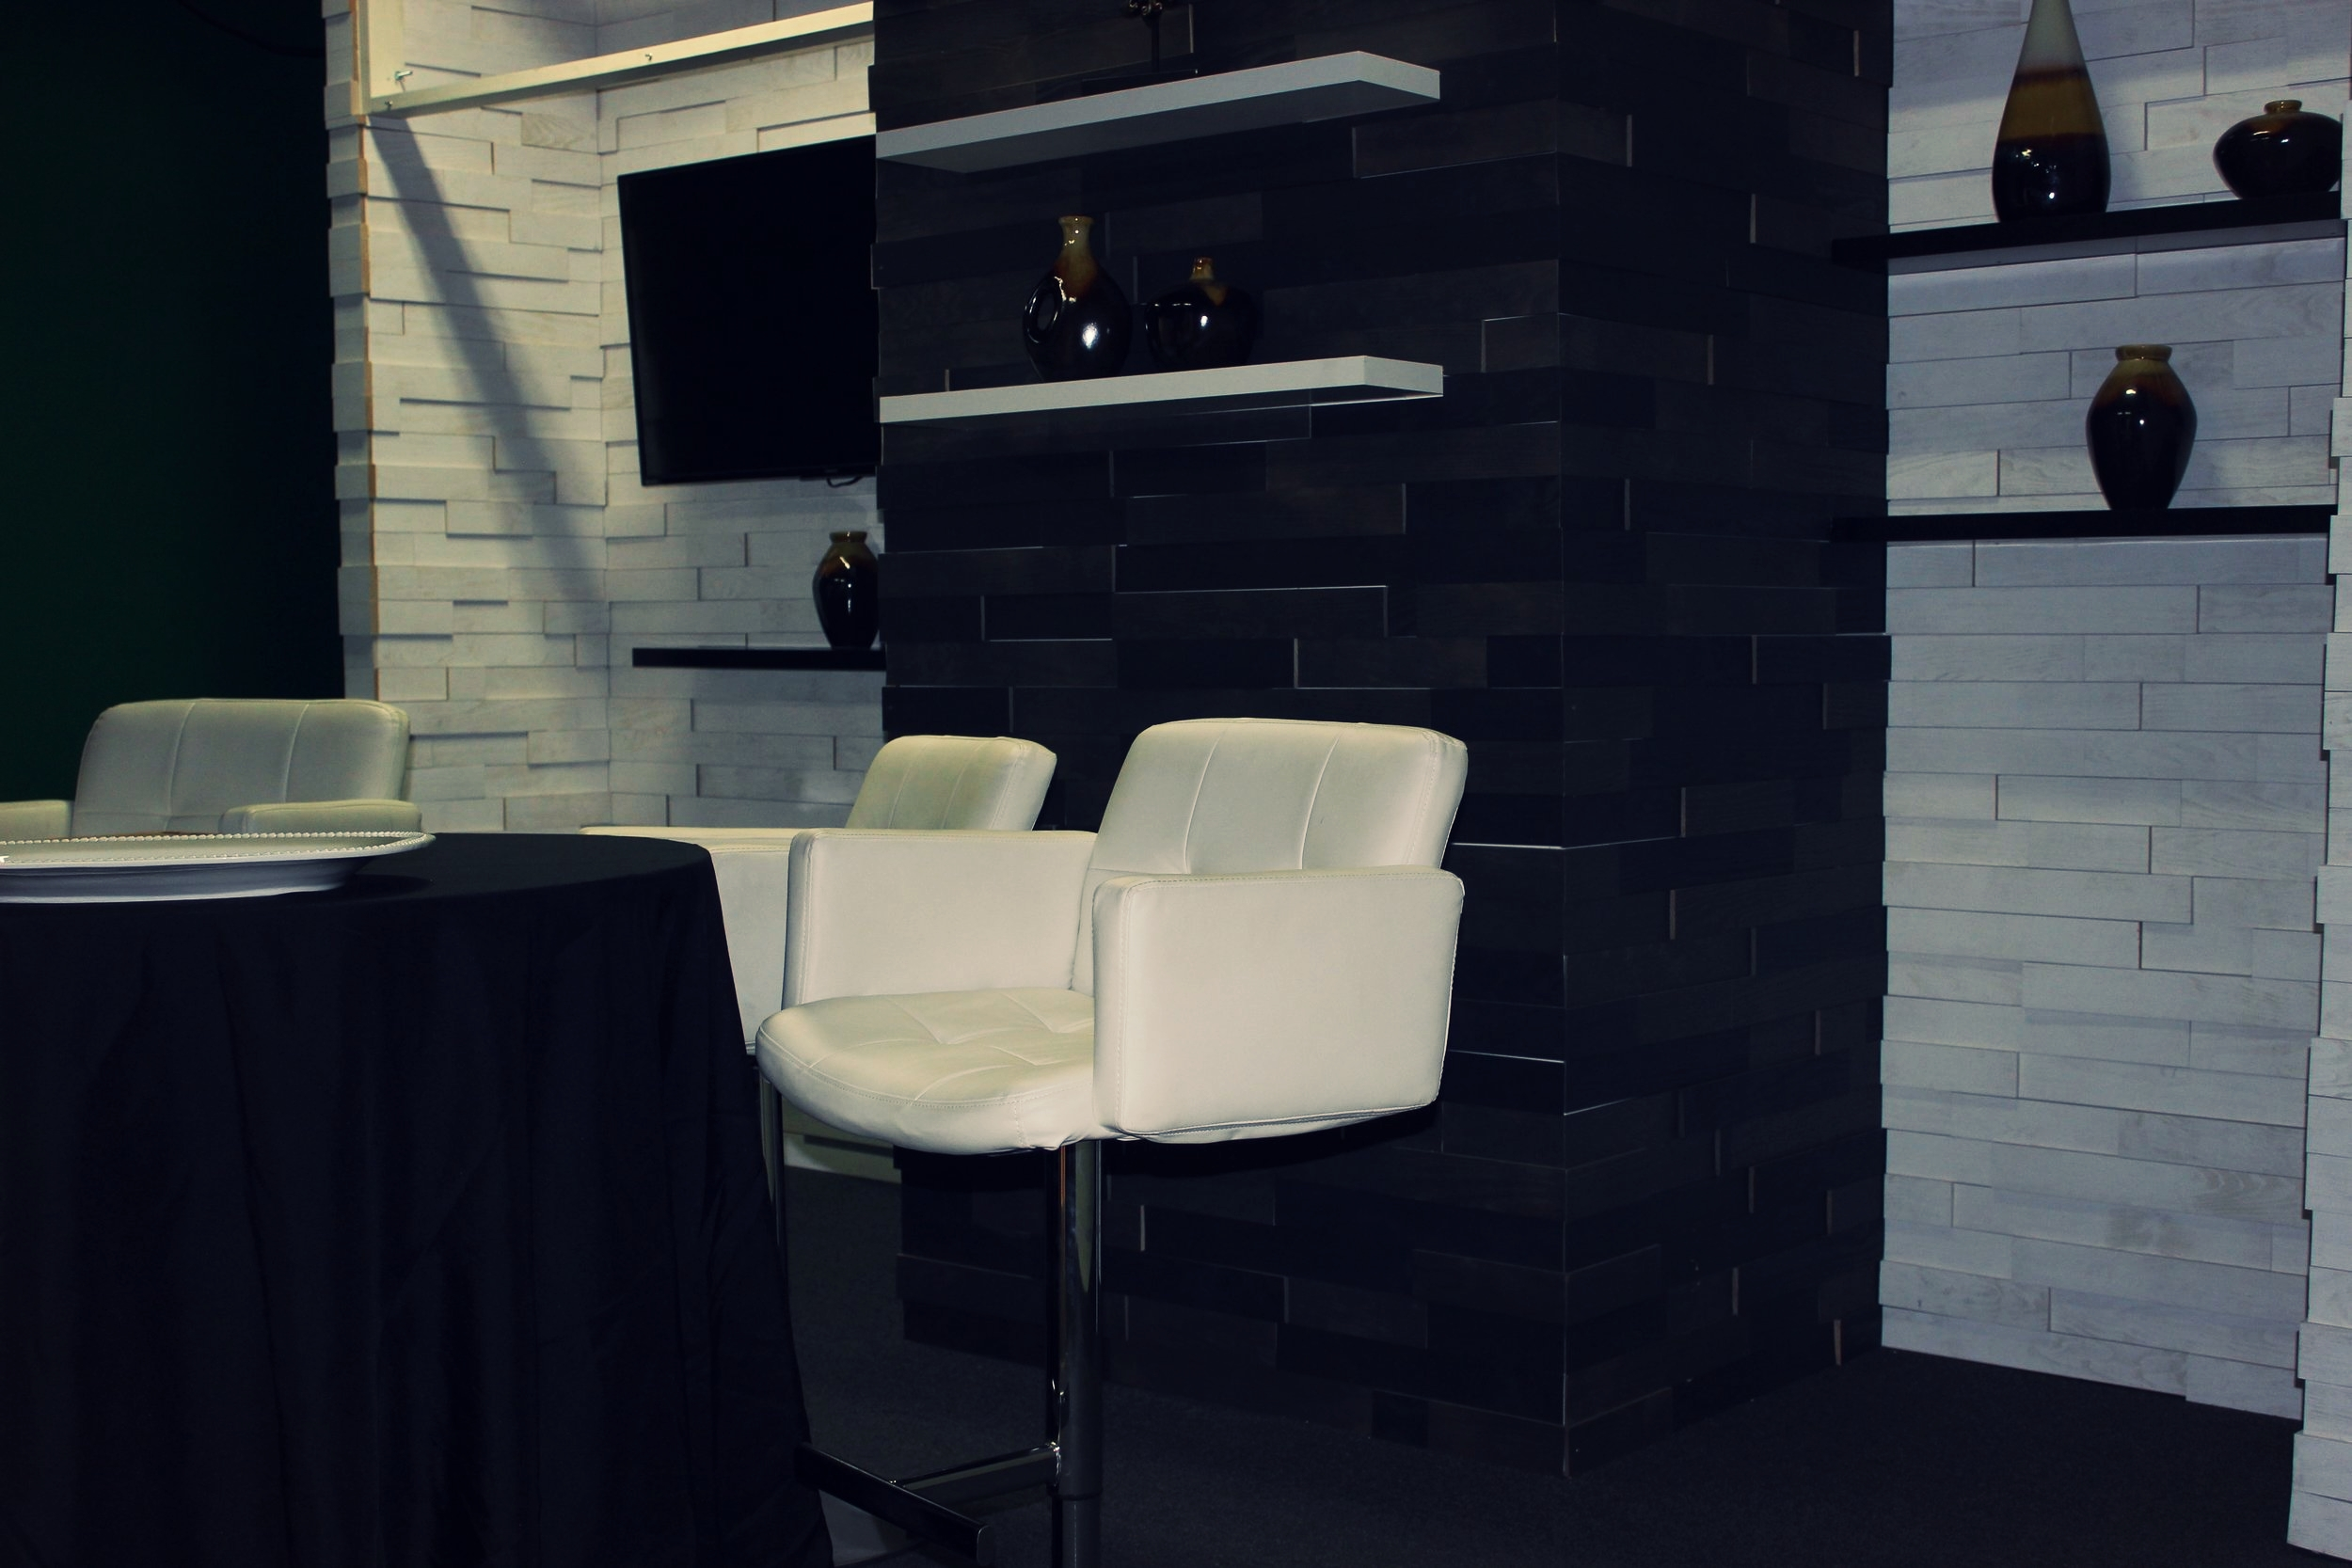 Large video studio